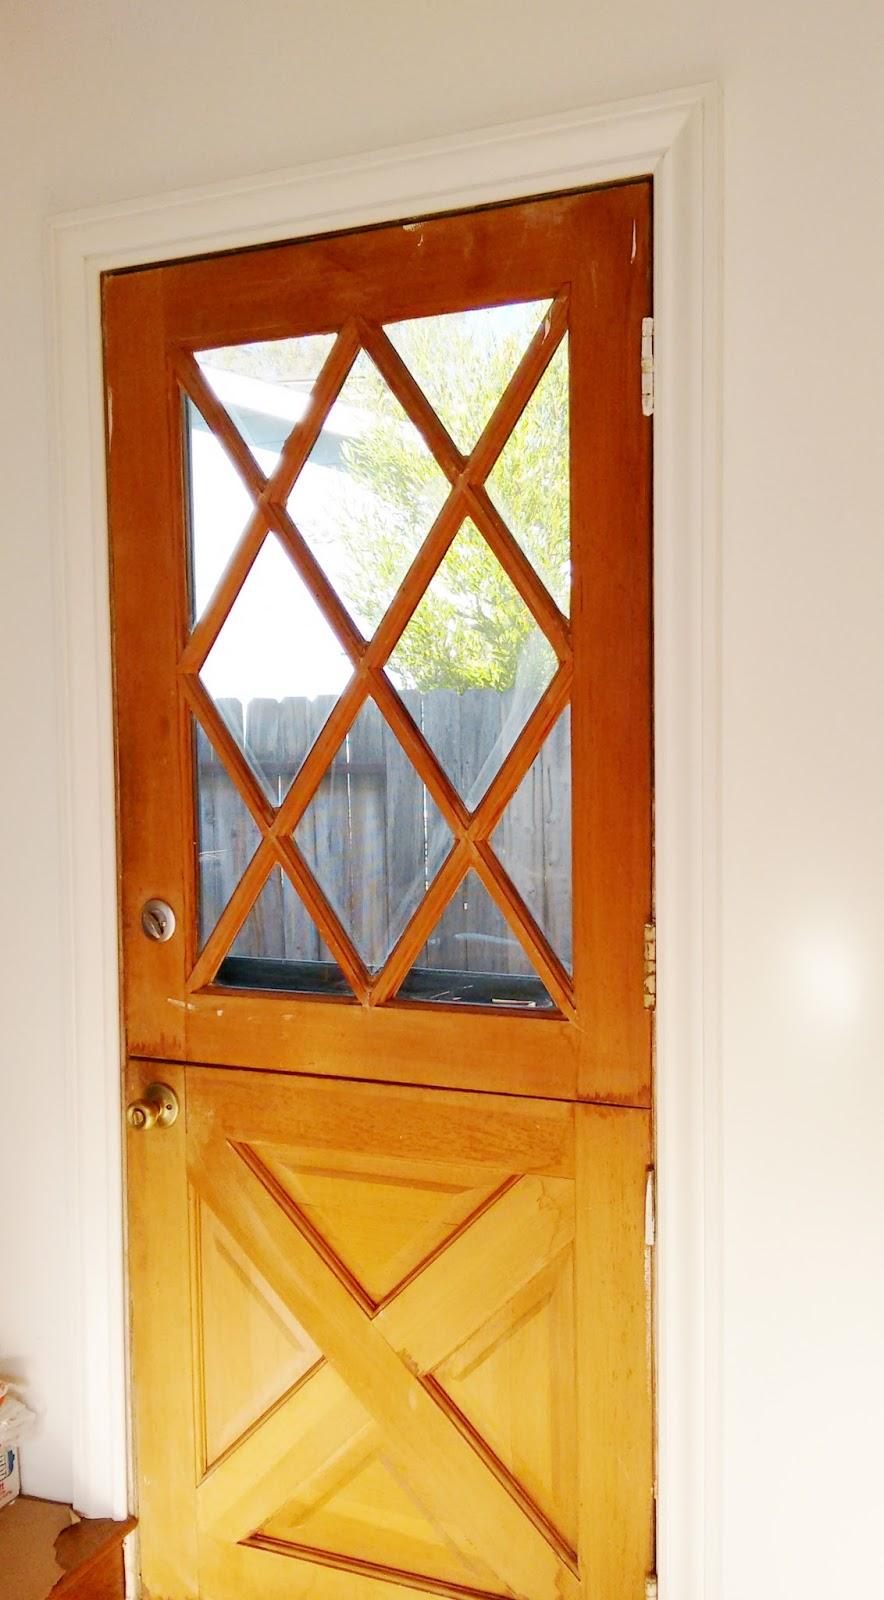 CAD INTERIORS family room remodel interior design DIY trimwork one room challenge ORC